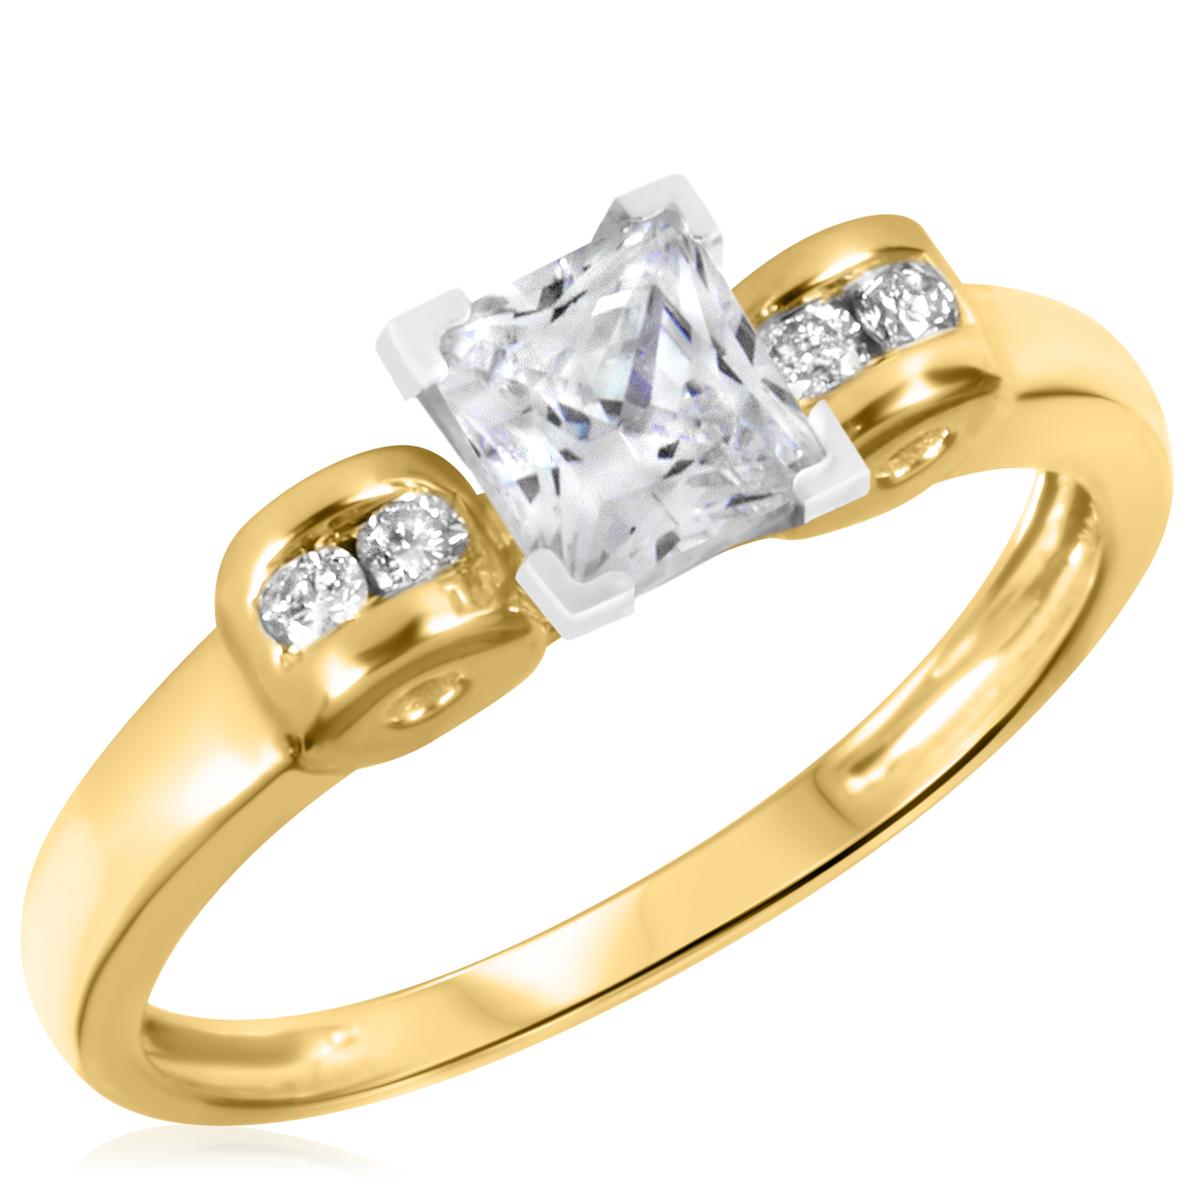 1 1/10 CT. T.W. Diamond Ladies Engagement Ring 14K Yellow Gold- Size 8